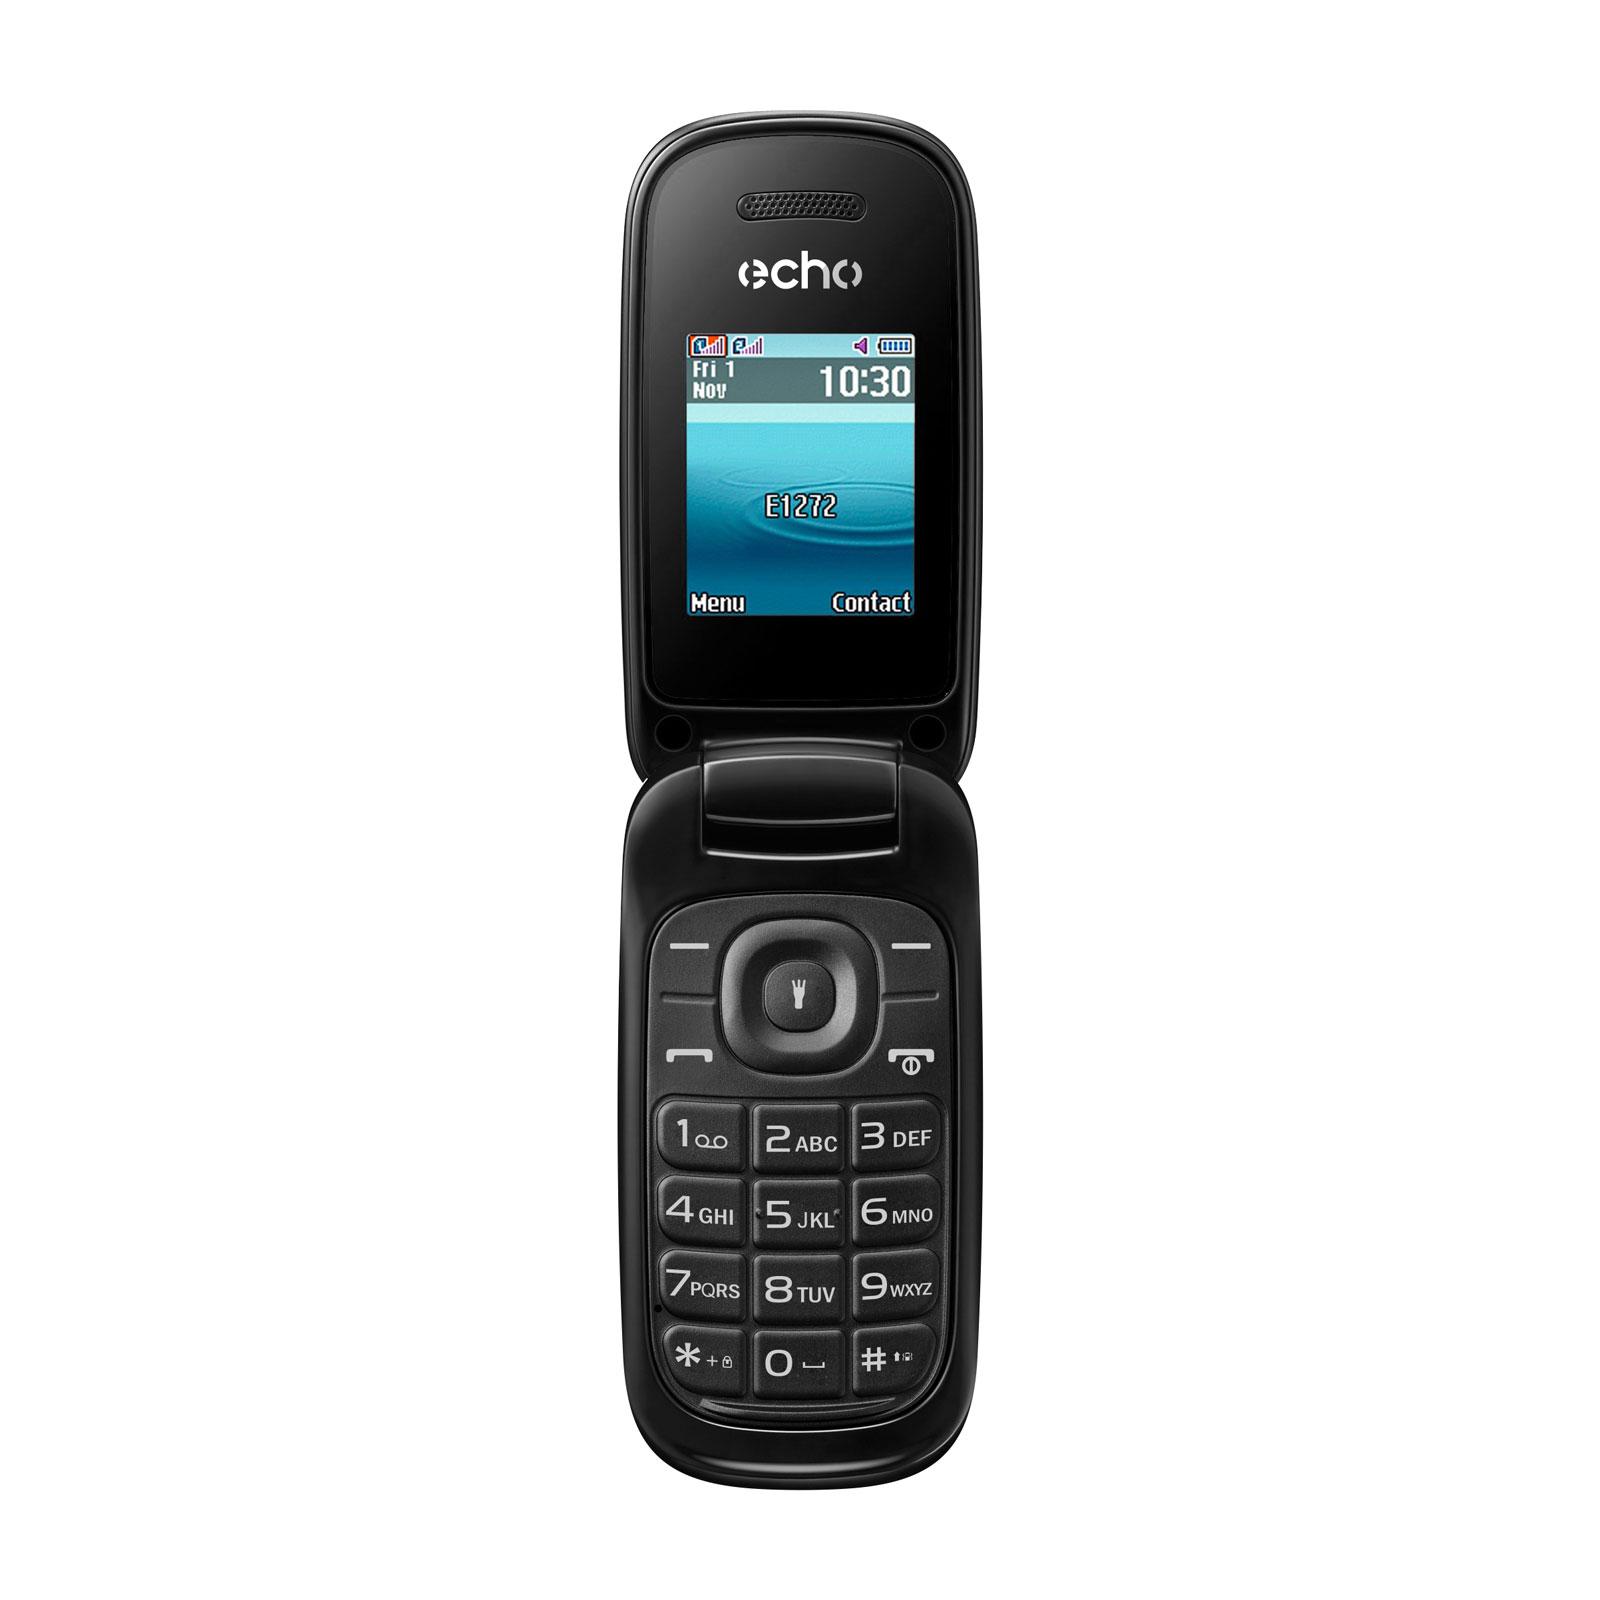 "Mobile & smartphone Echo Clap 2 Noir Téléphone 2G Dual SIM - RAM 32 Mo - Ecran 1.77"" - 32 Mo - Bluetooth 2.1 - 800 mAh"